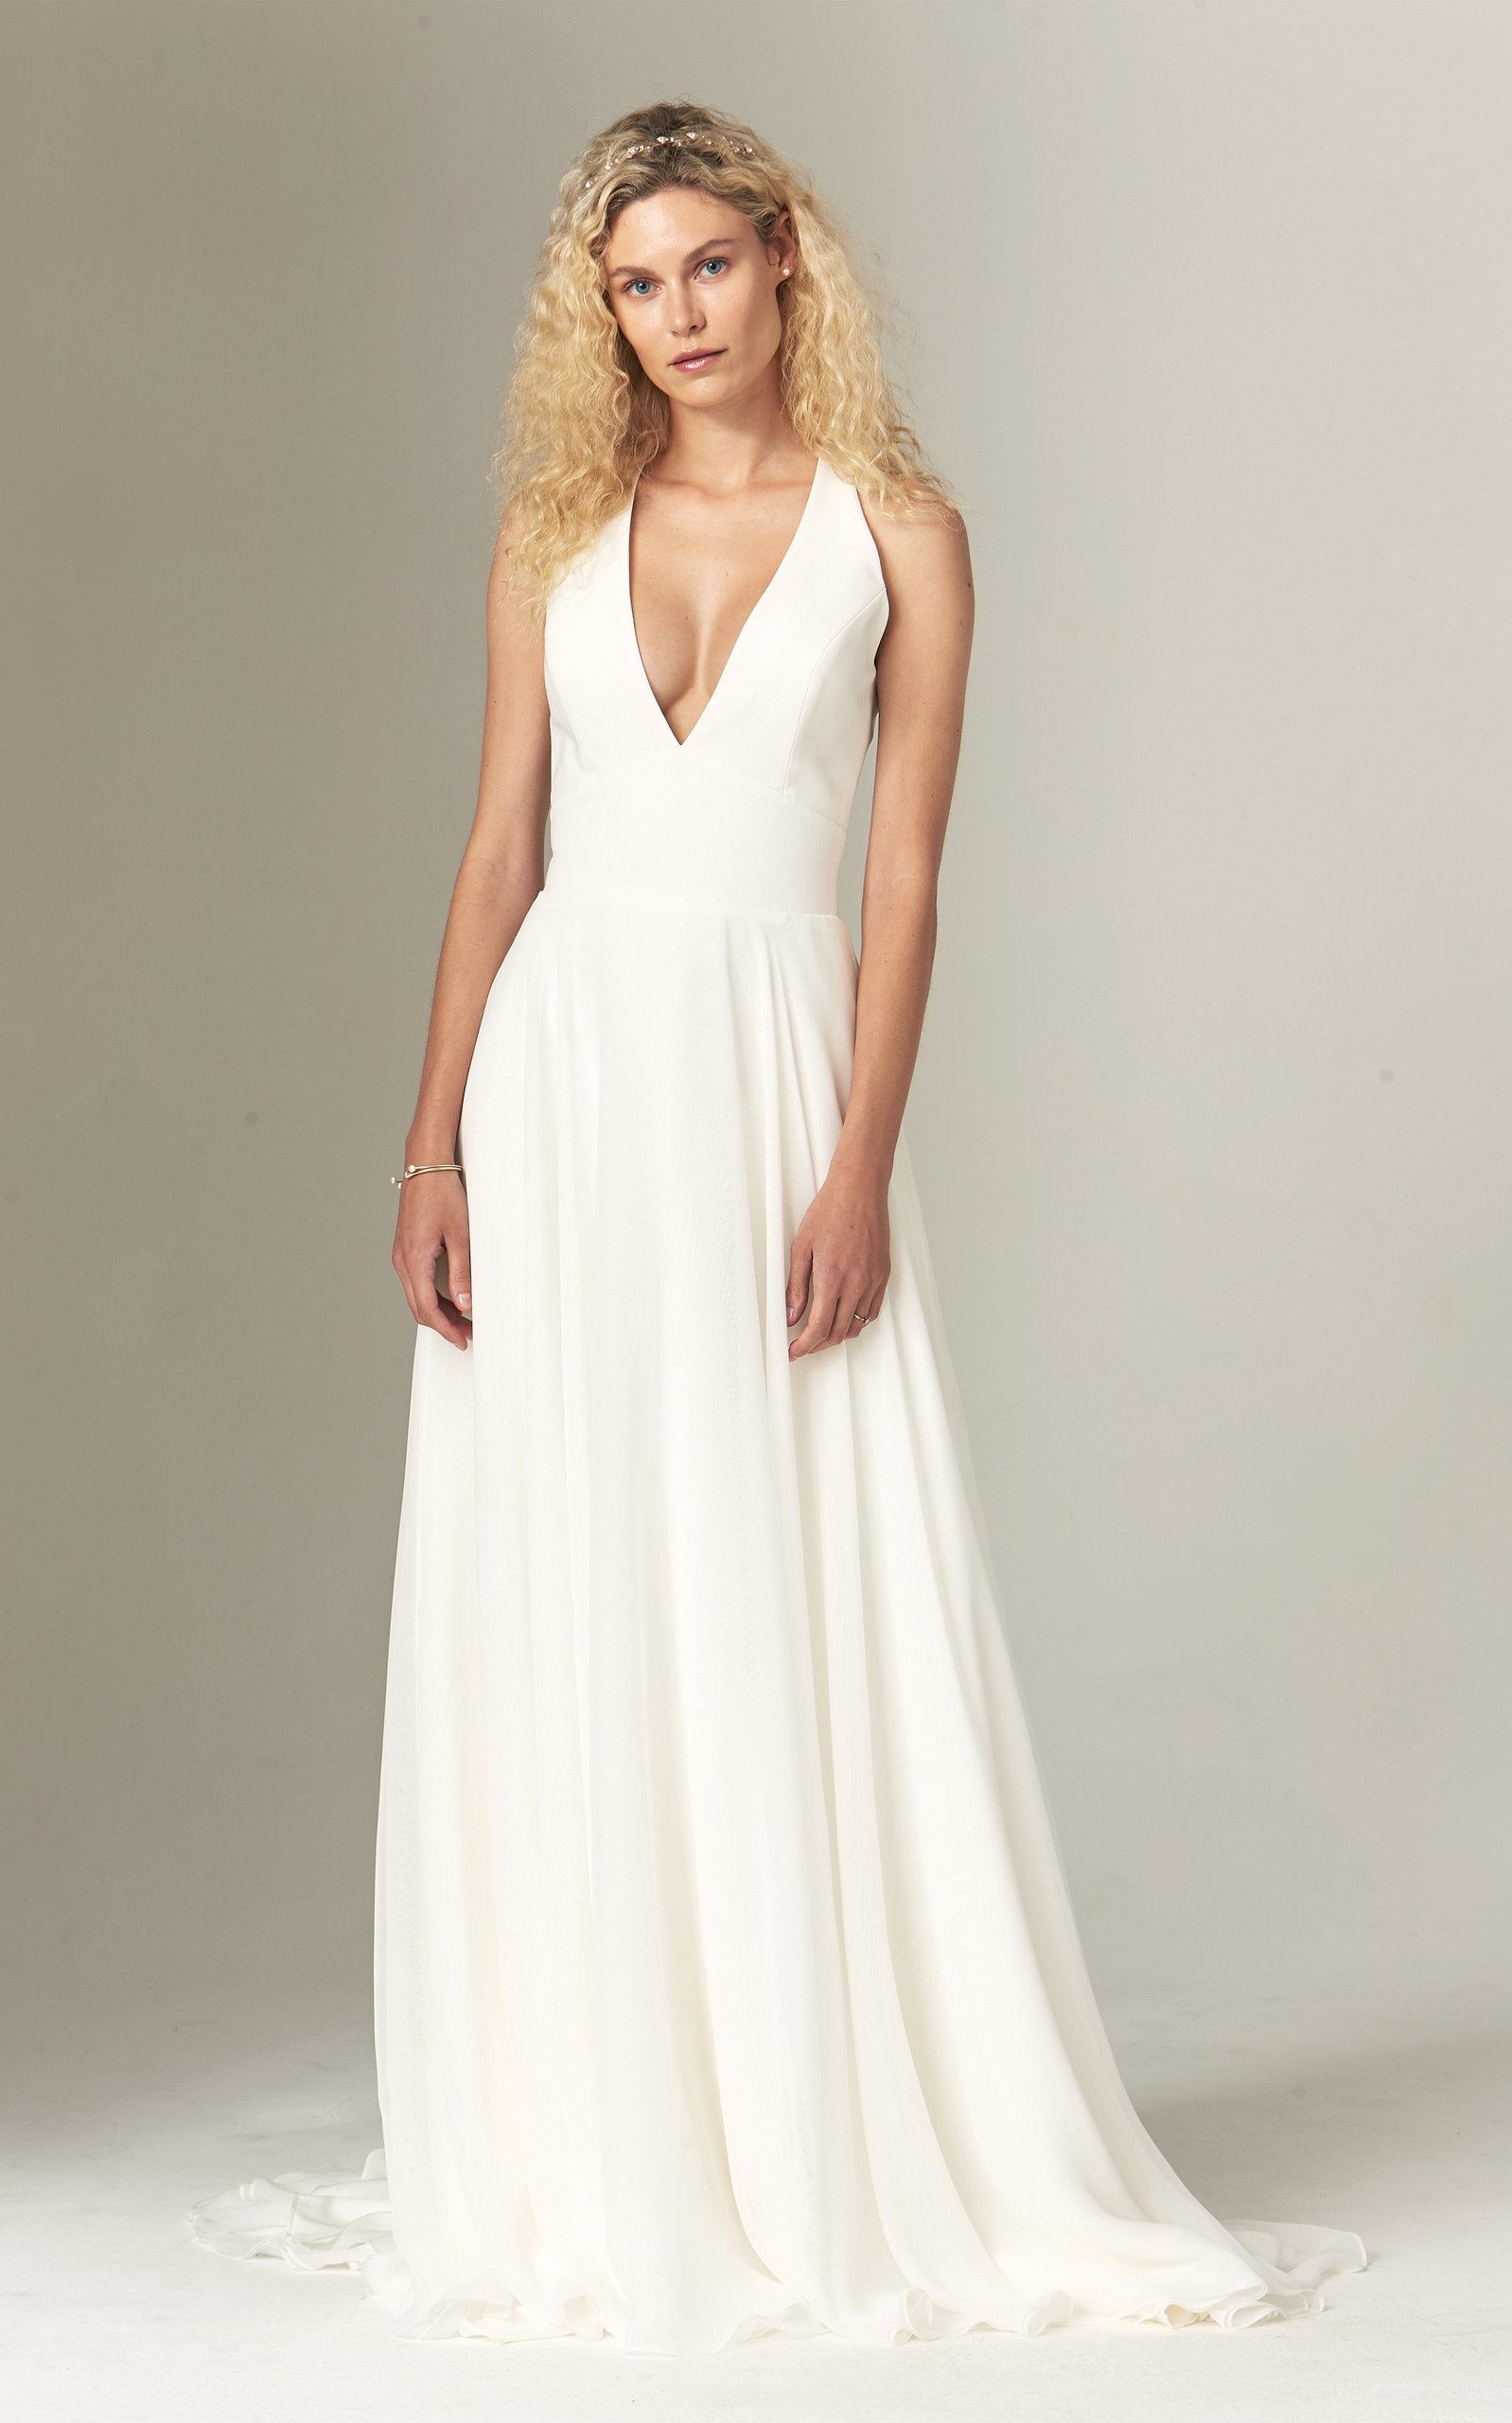 Savannah Miller - Elizabeth Halter Neck Crepe Gown